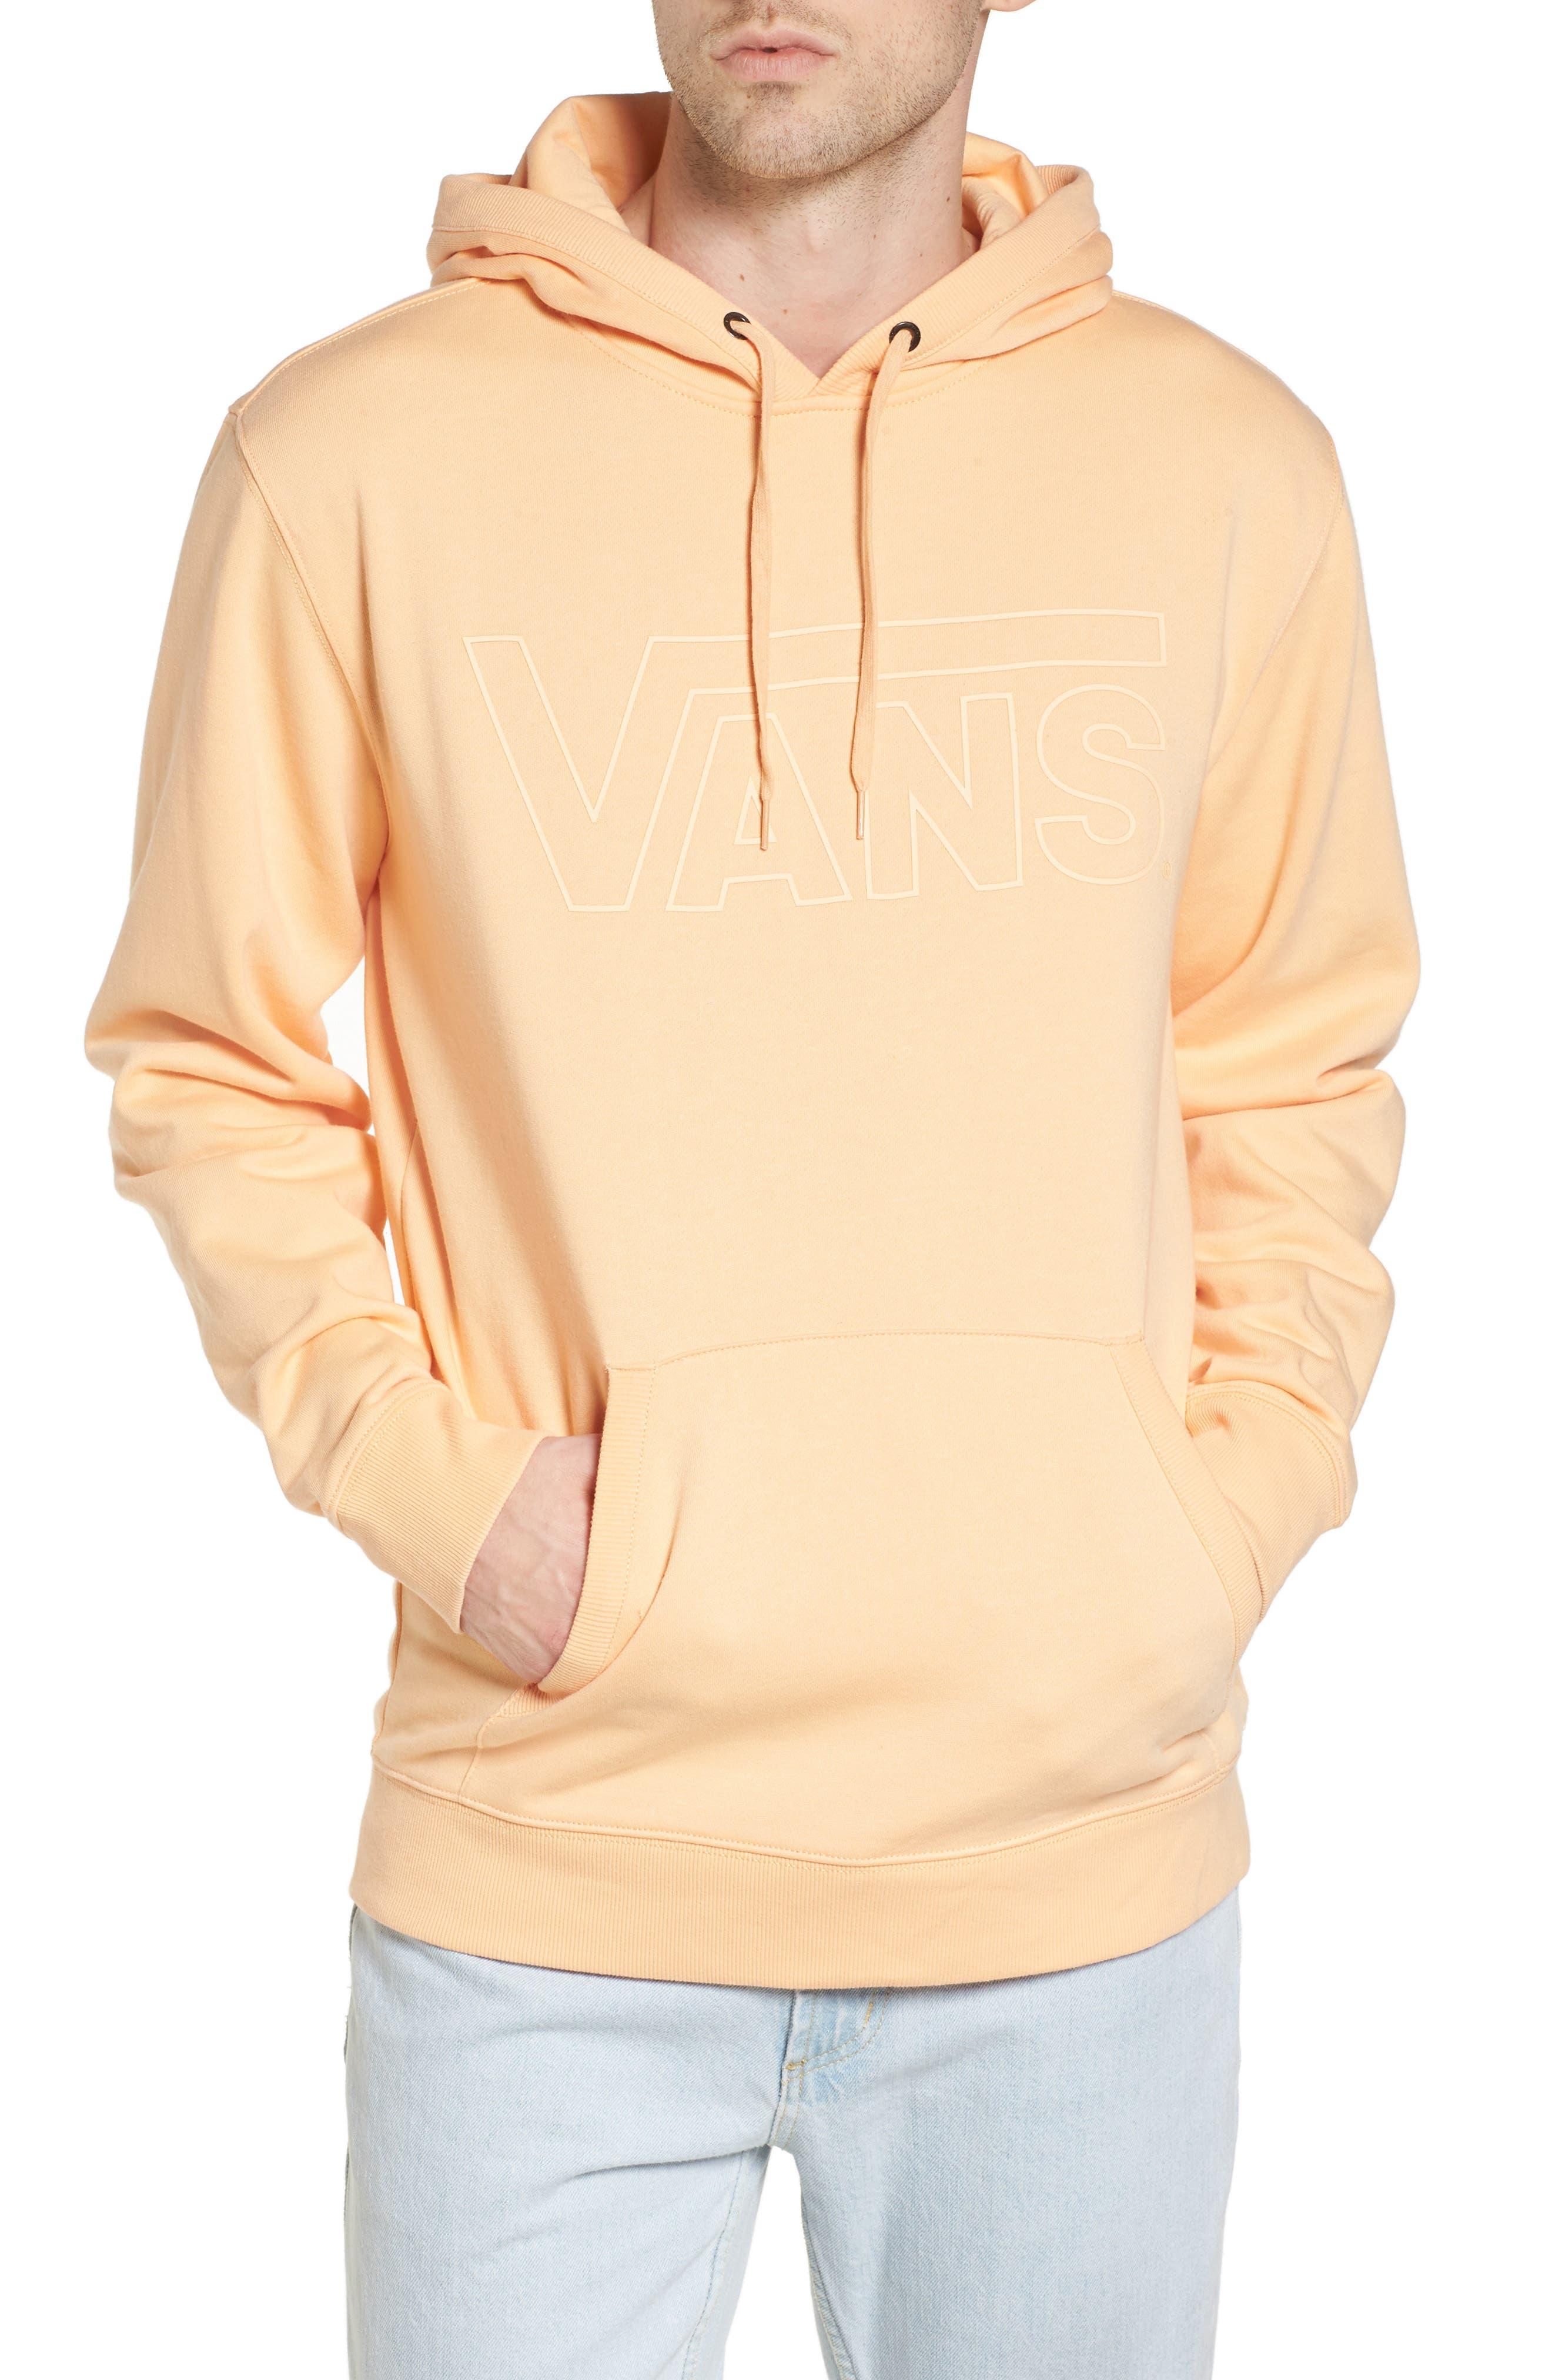 Vans Classic Hoodie Sweatshirt